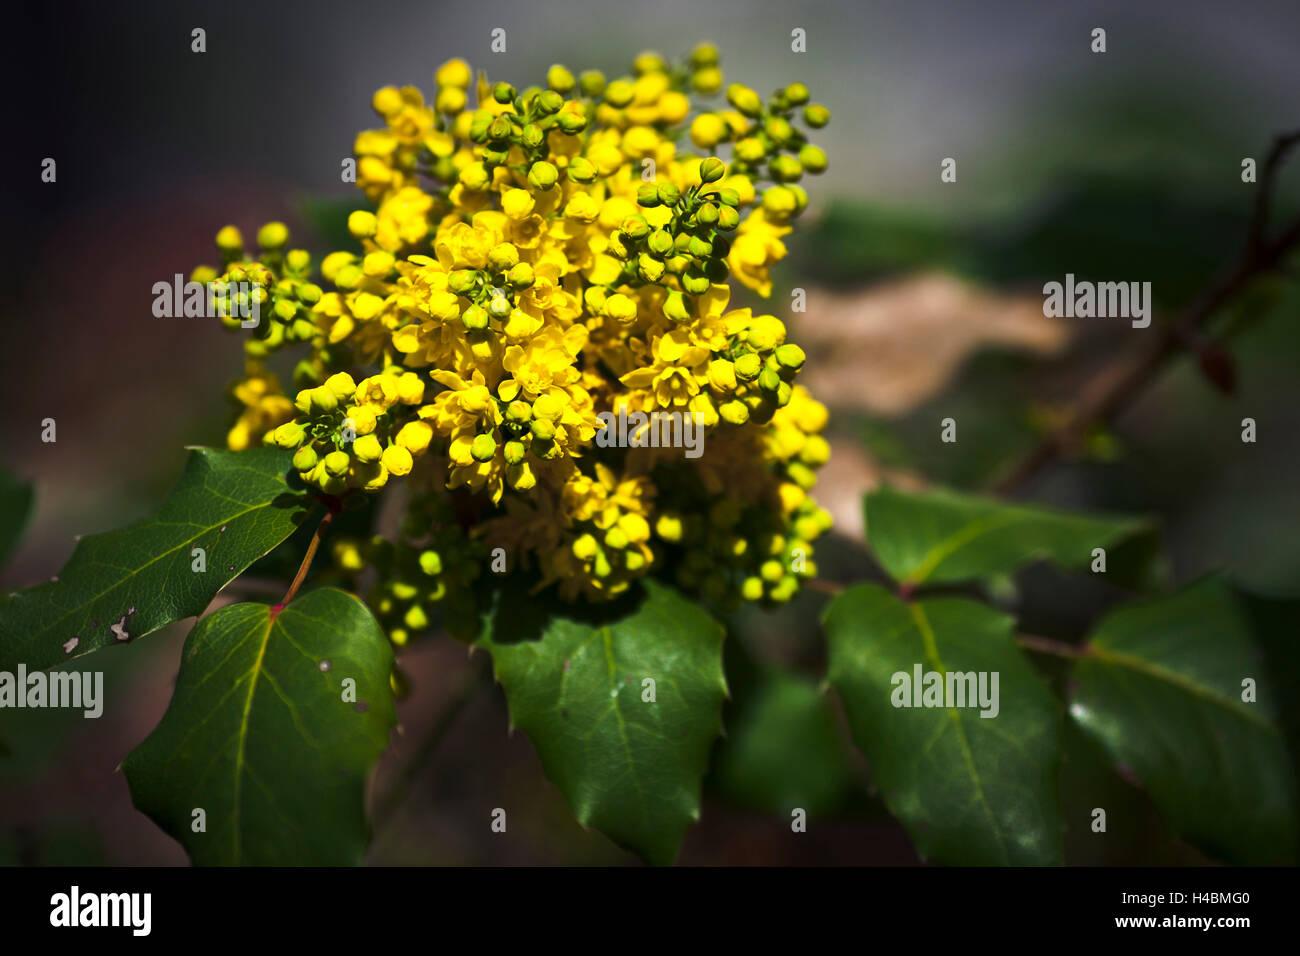 Botany, shrub, blossoms, buds - Stock Image